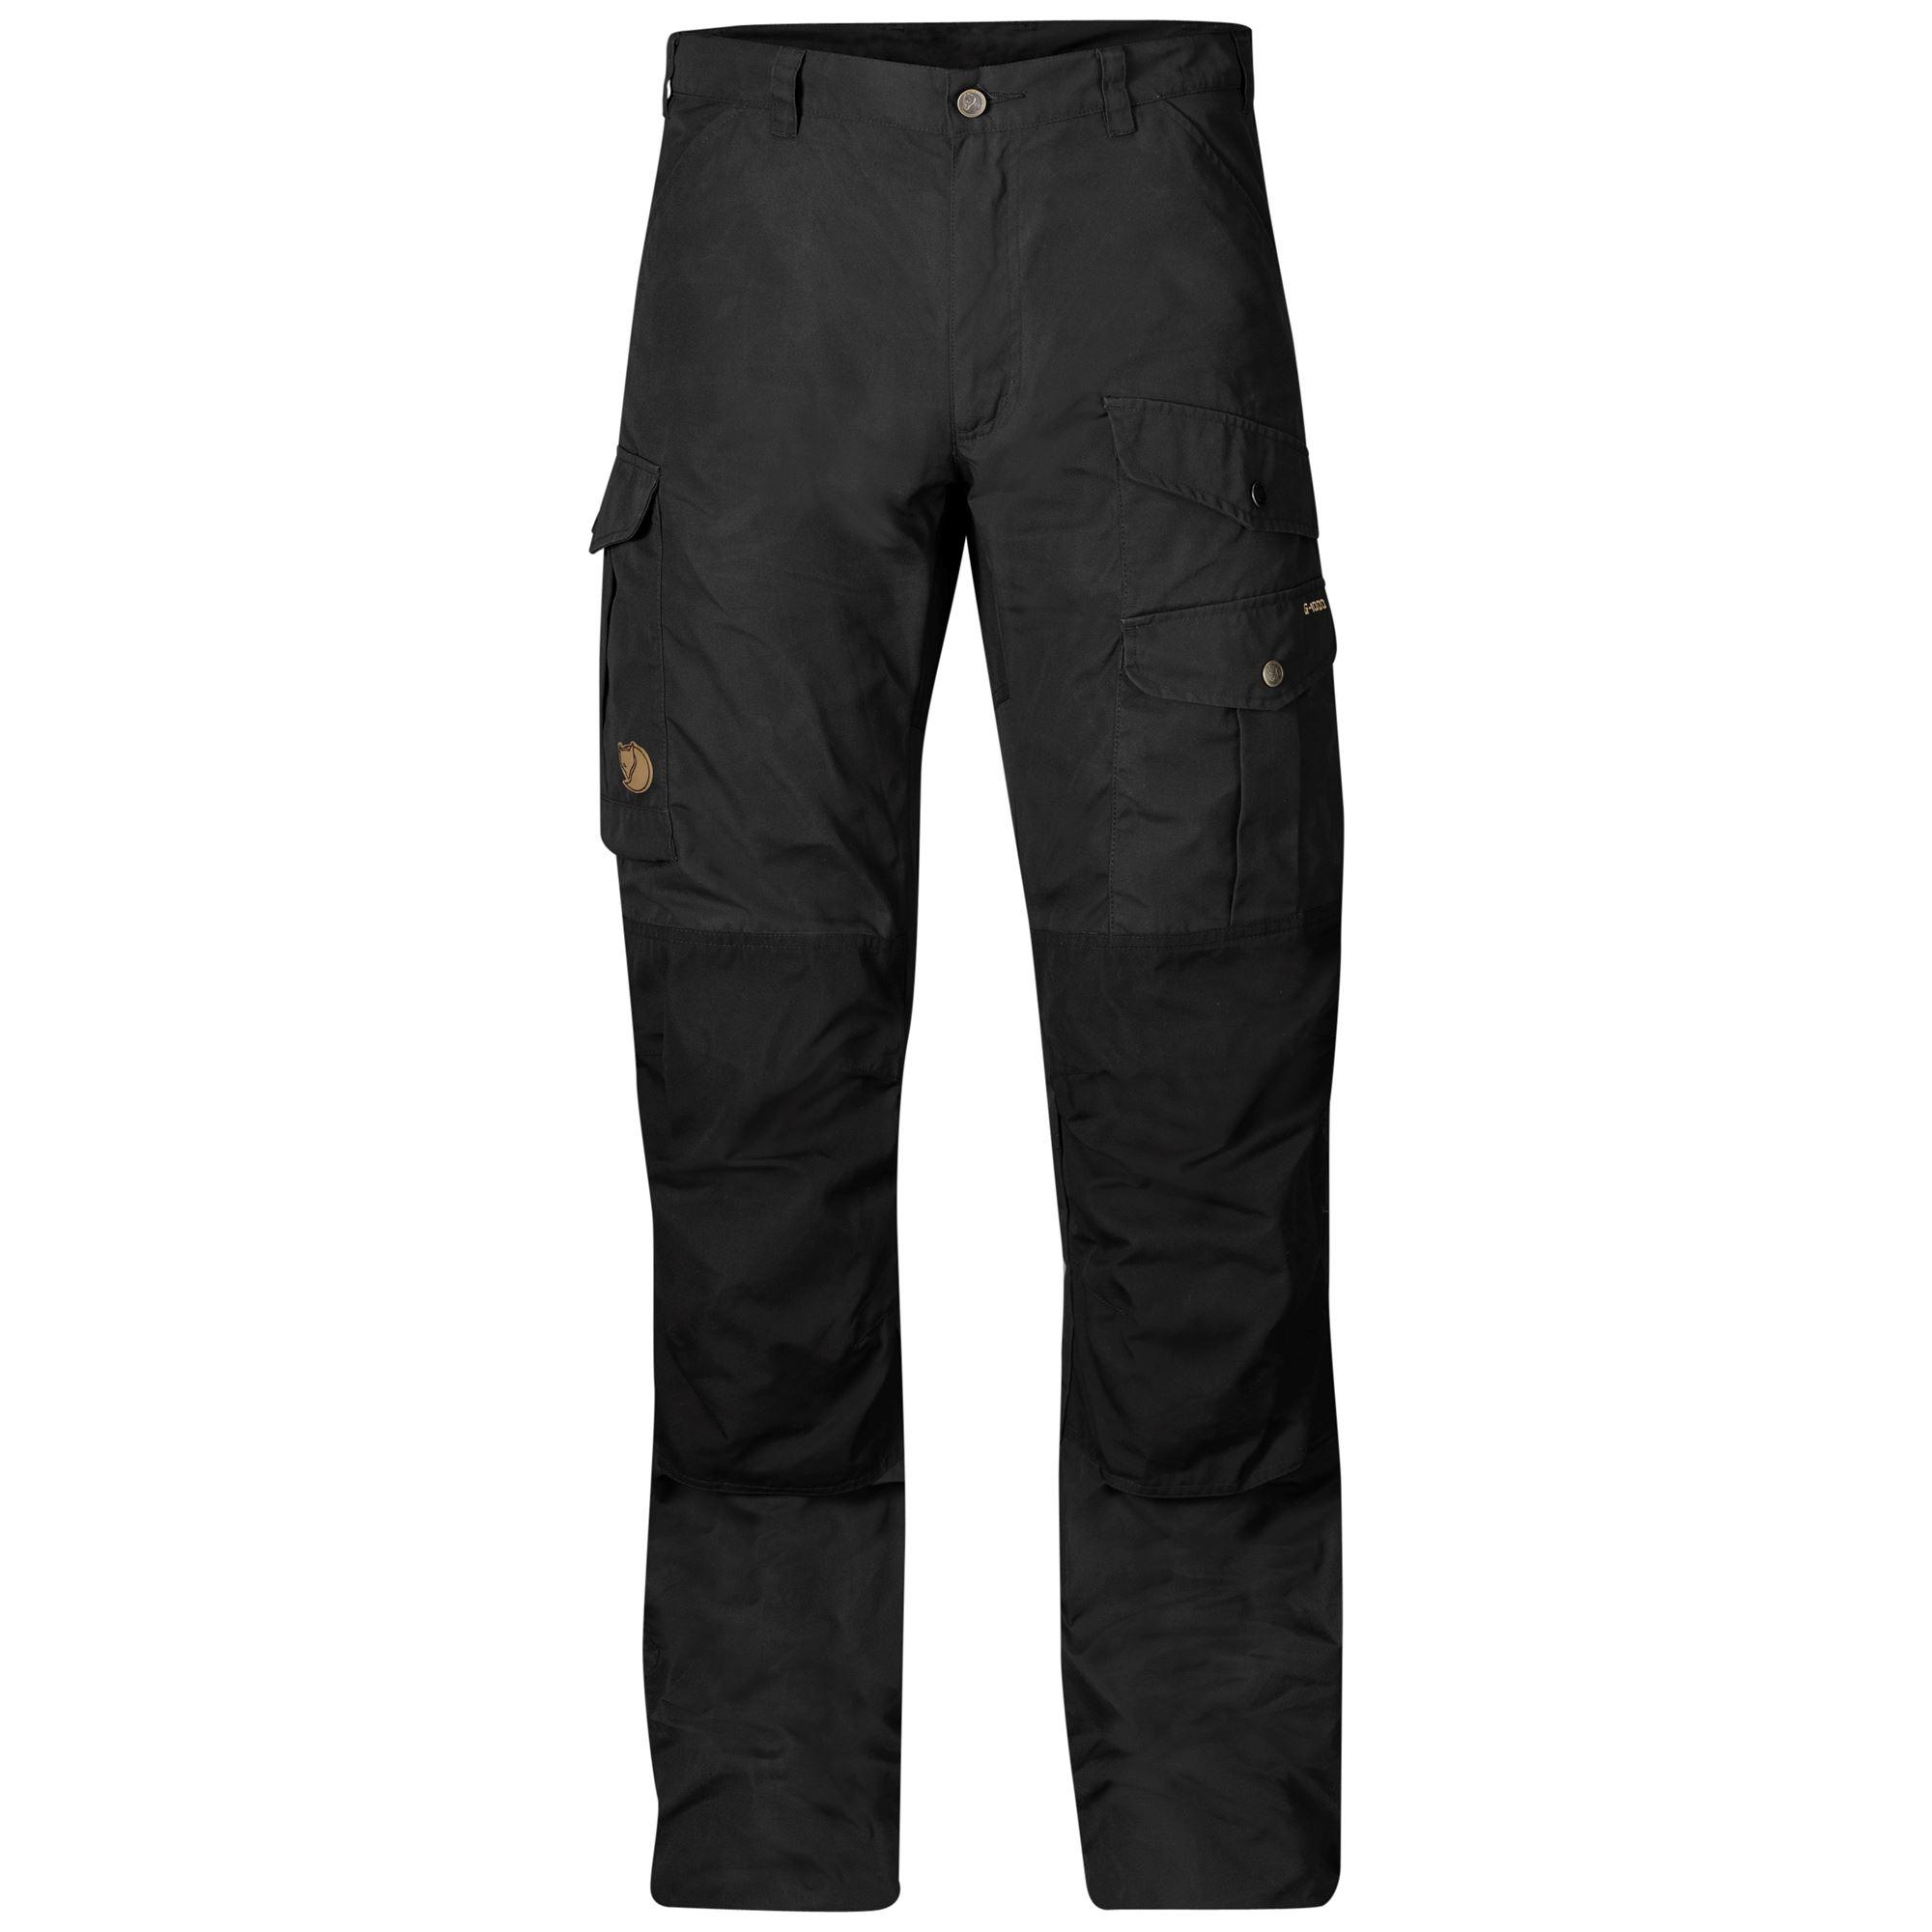 Fjällräven Barents Pro Trousers - Pantalon homme